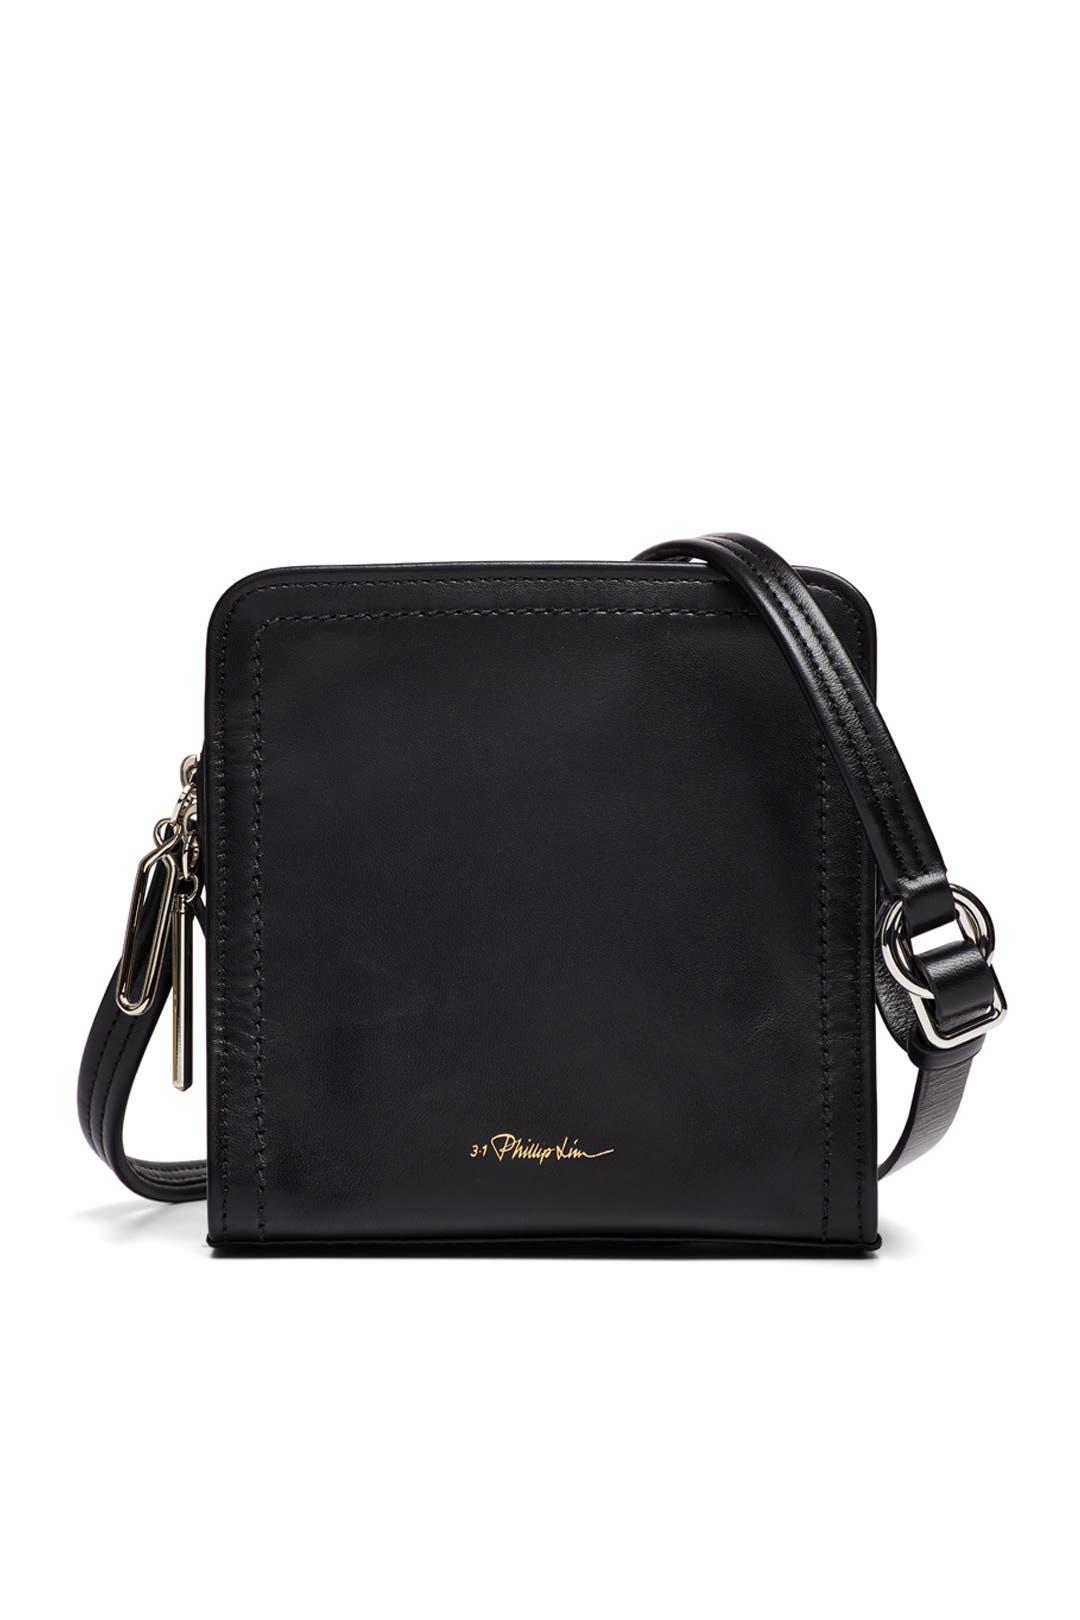 388b0fb7b354 3.1 Phillip Lim Accessories. Read Reviews. Hudson Mini Square Bag